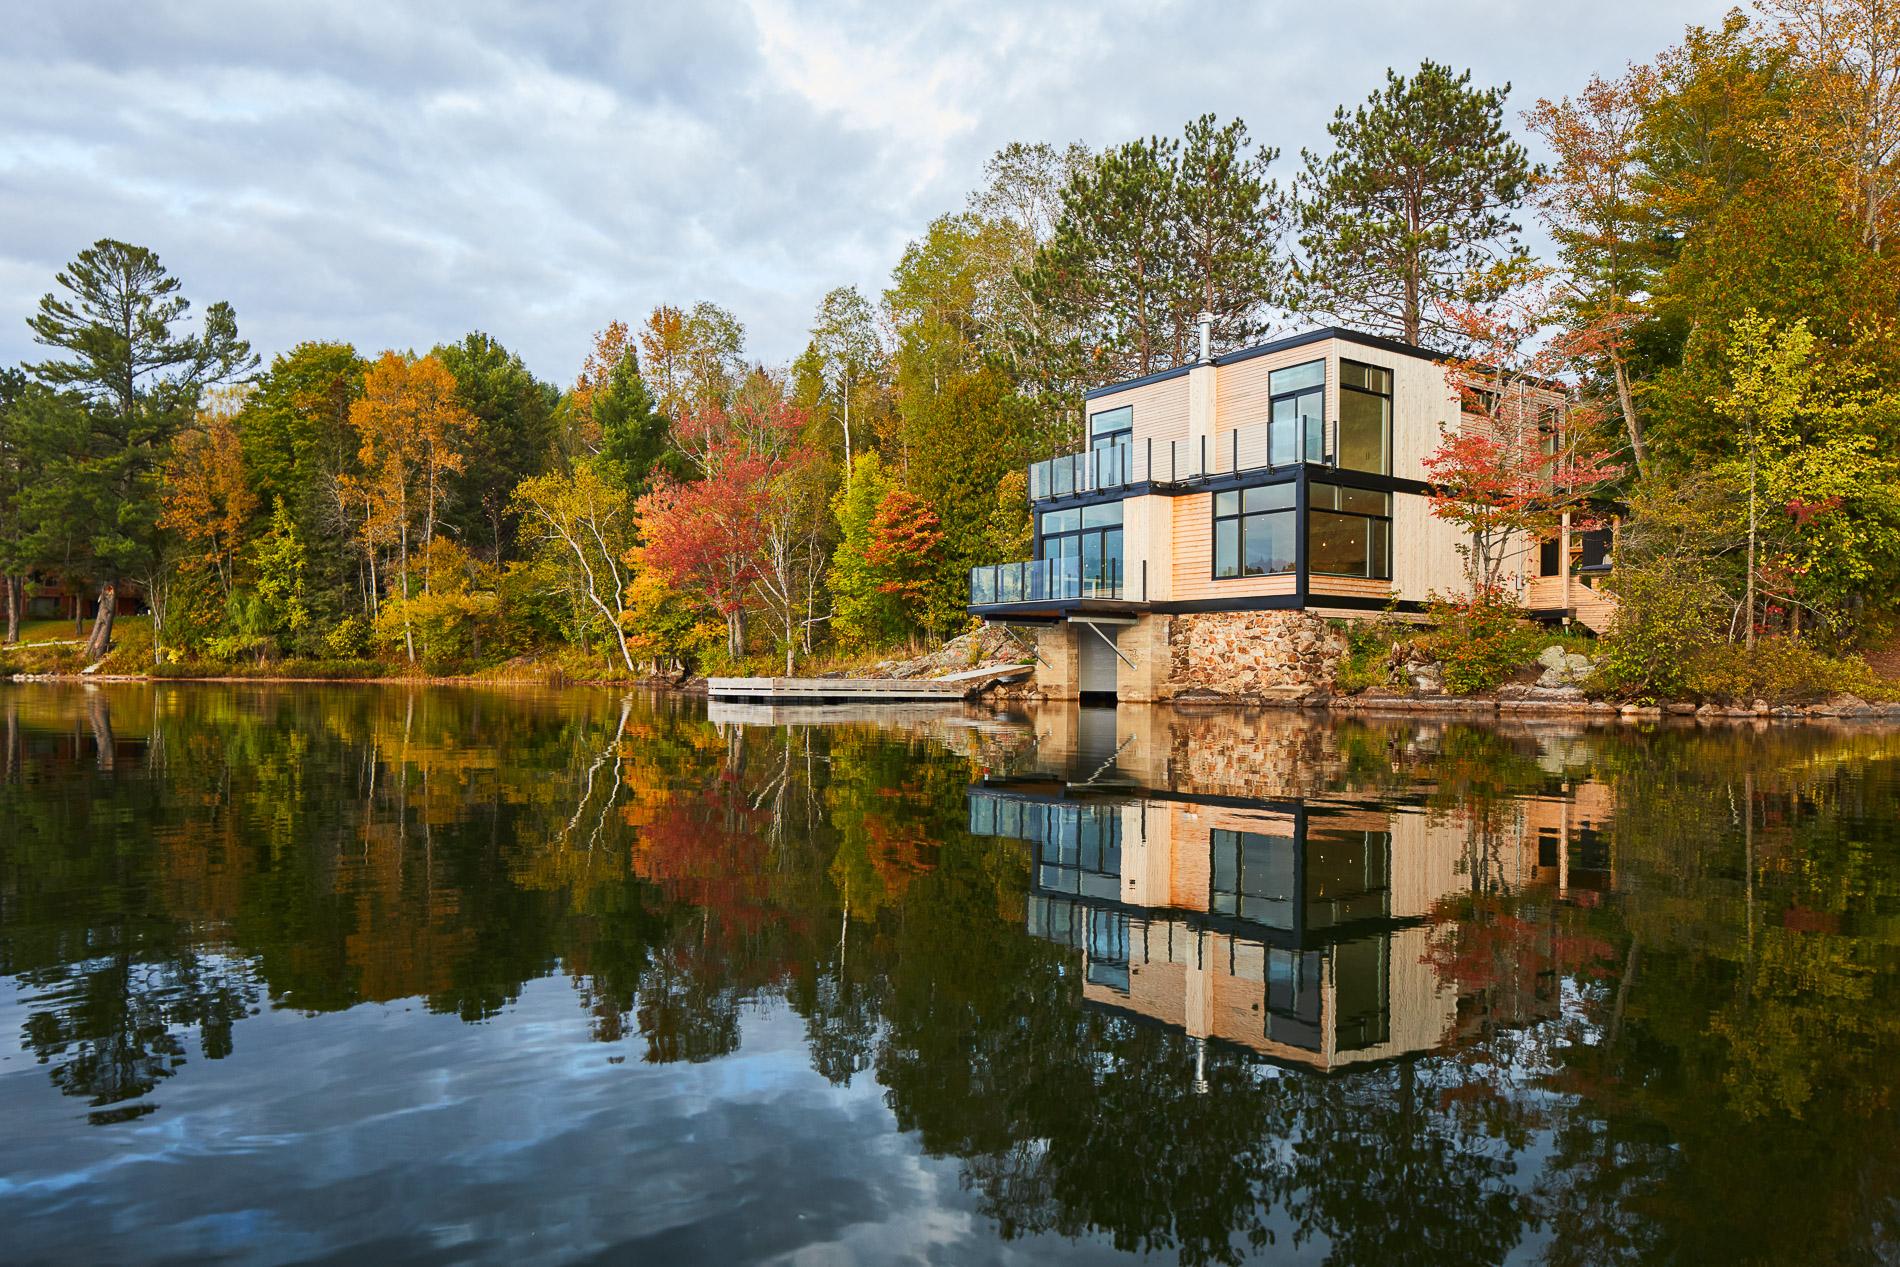 027-Shean Architects Val des Monts.jpg